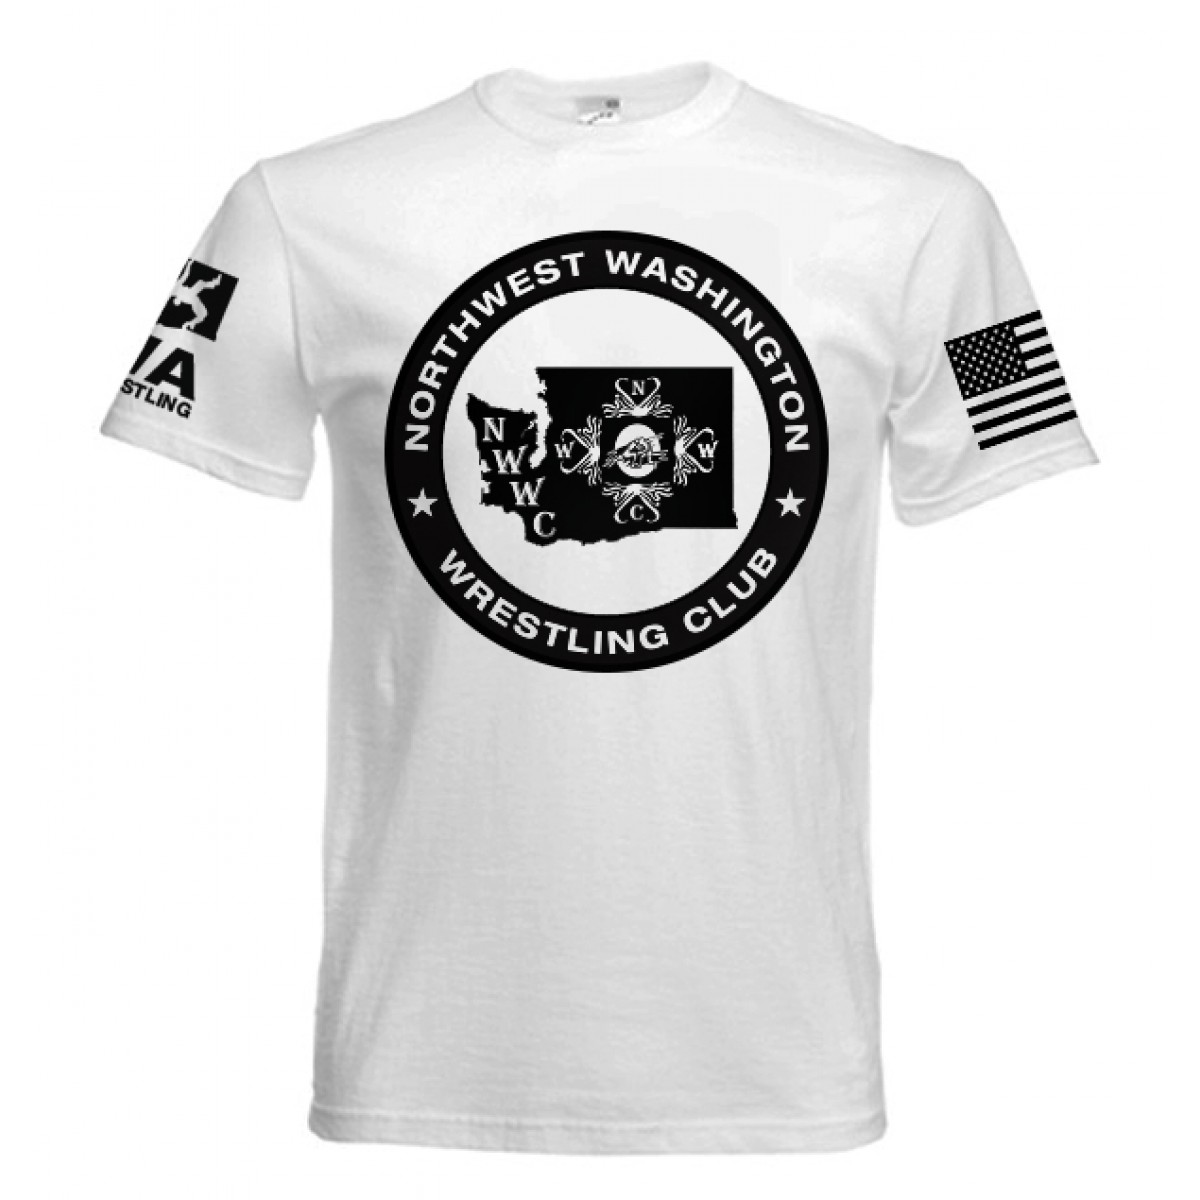 NWWC White T-shirt Black Logo-White-L